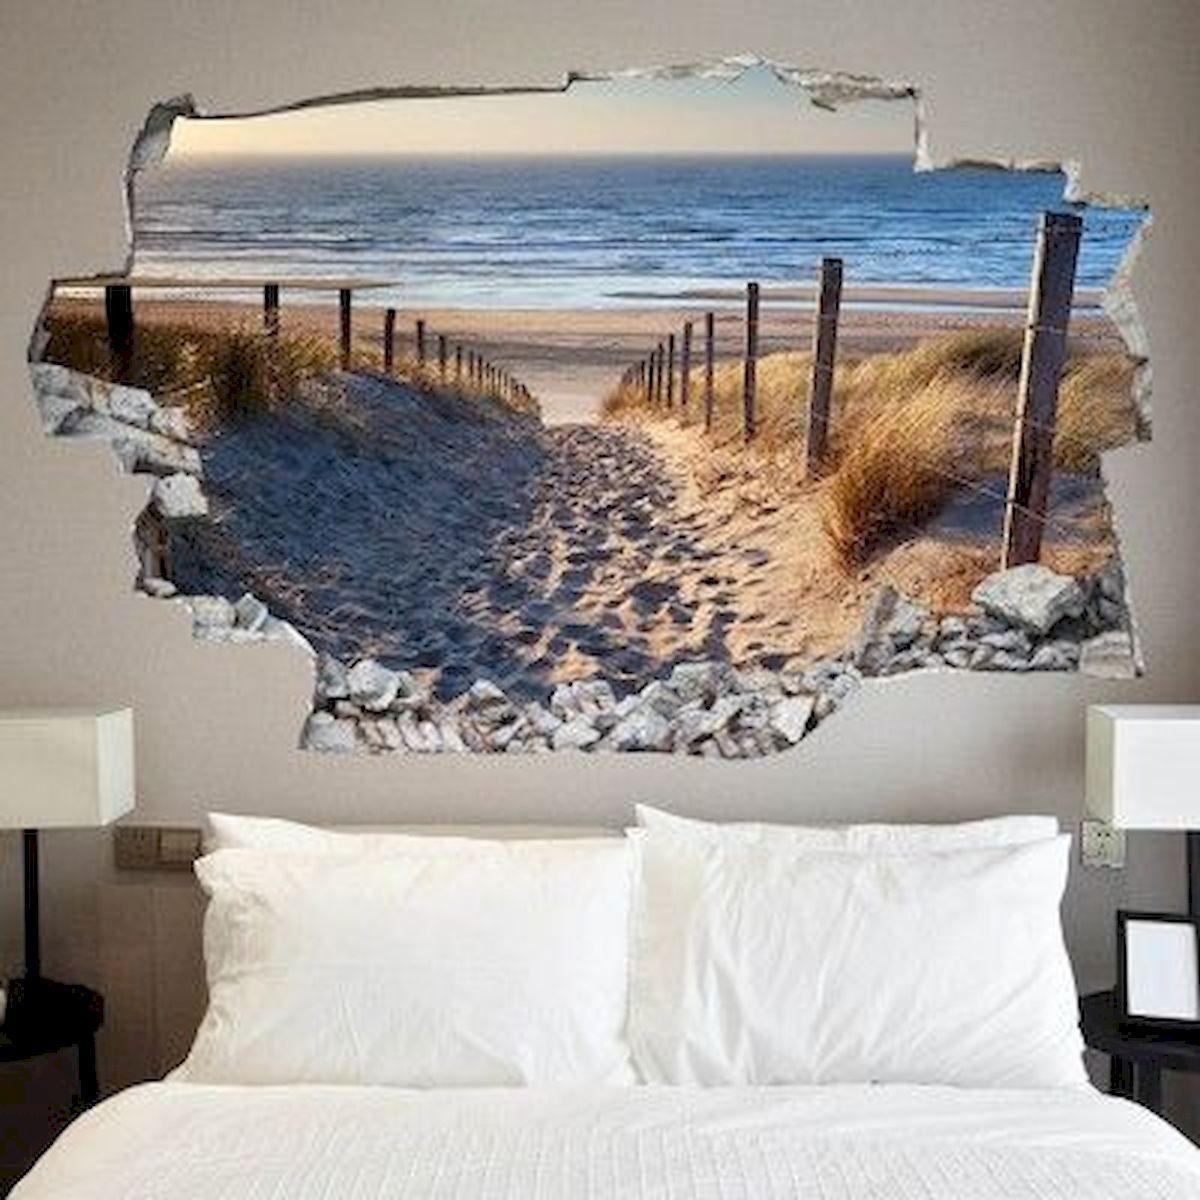 25 stunning wall painting ideas that so artsy (6) Beach